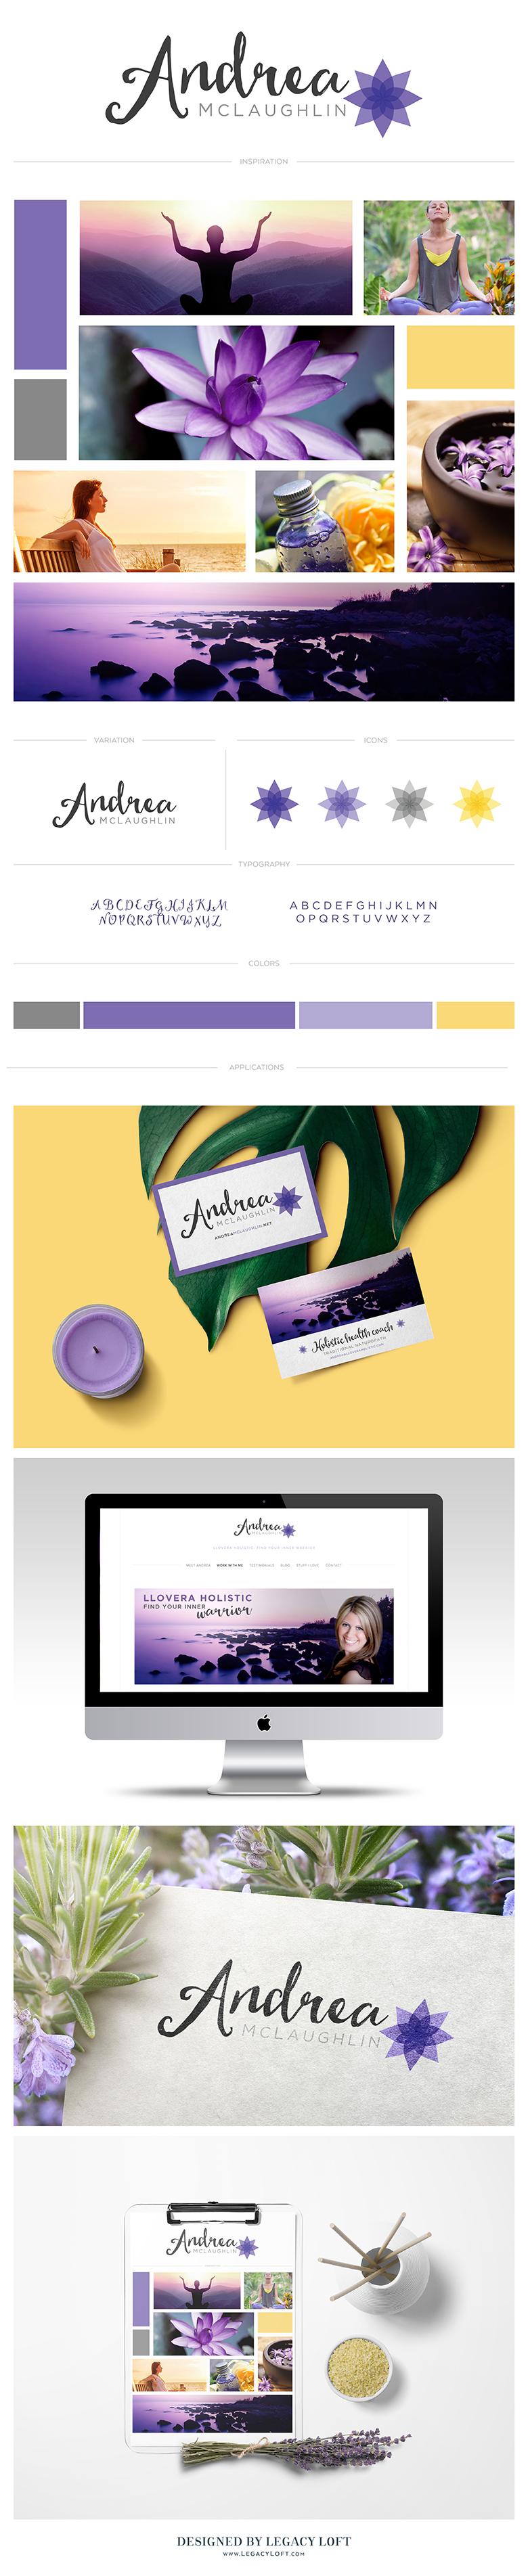 andrea-mclaughlin-branding-design-brand-board